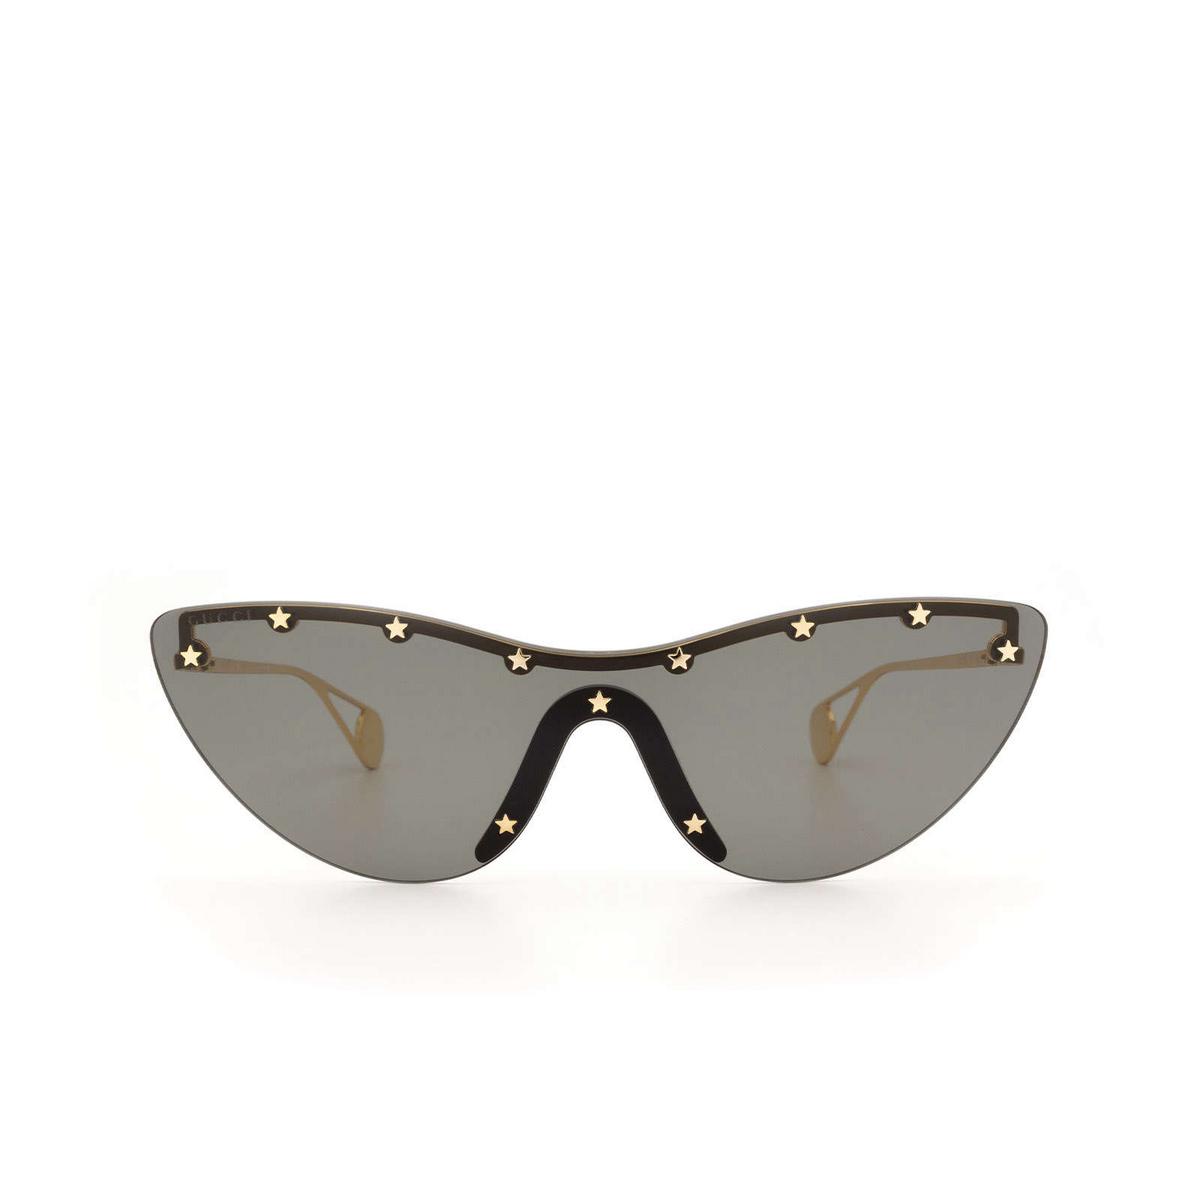 Gucci® Mask Sunglasses: GG0666S color Black 001 - front view.